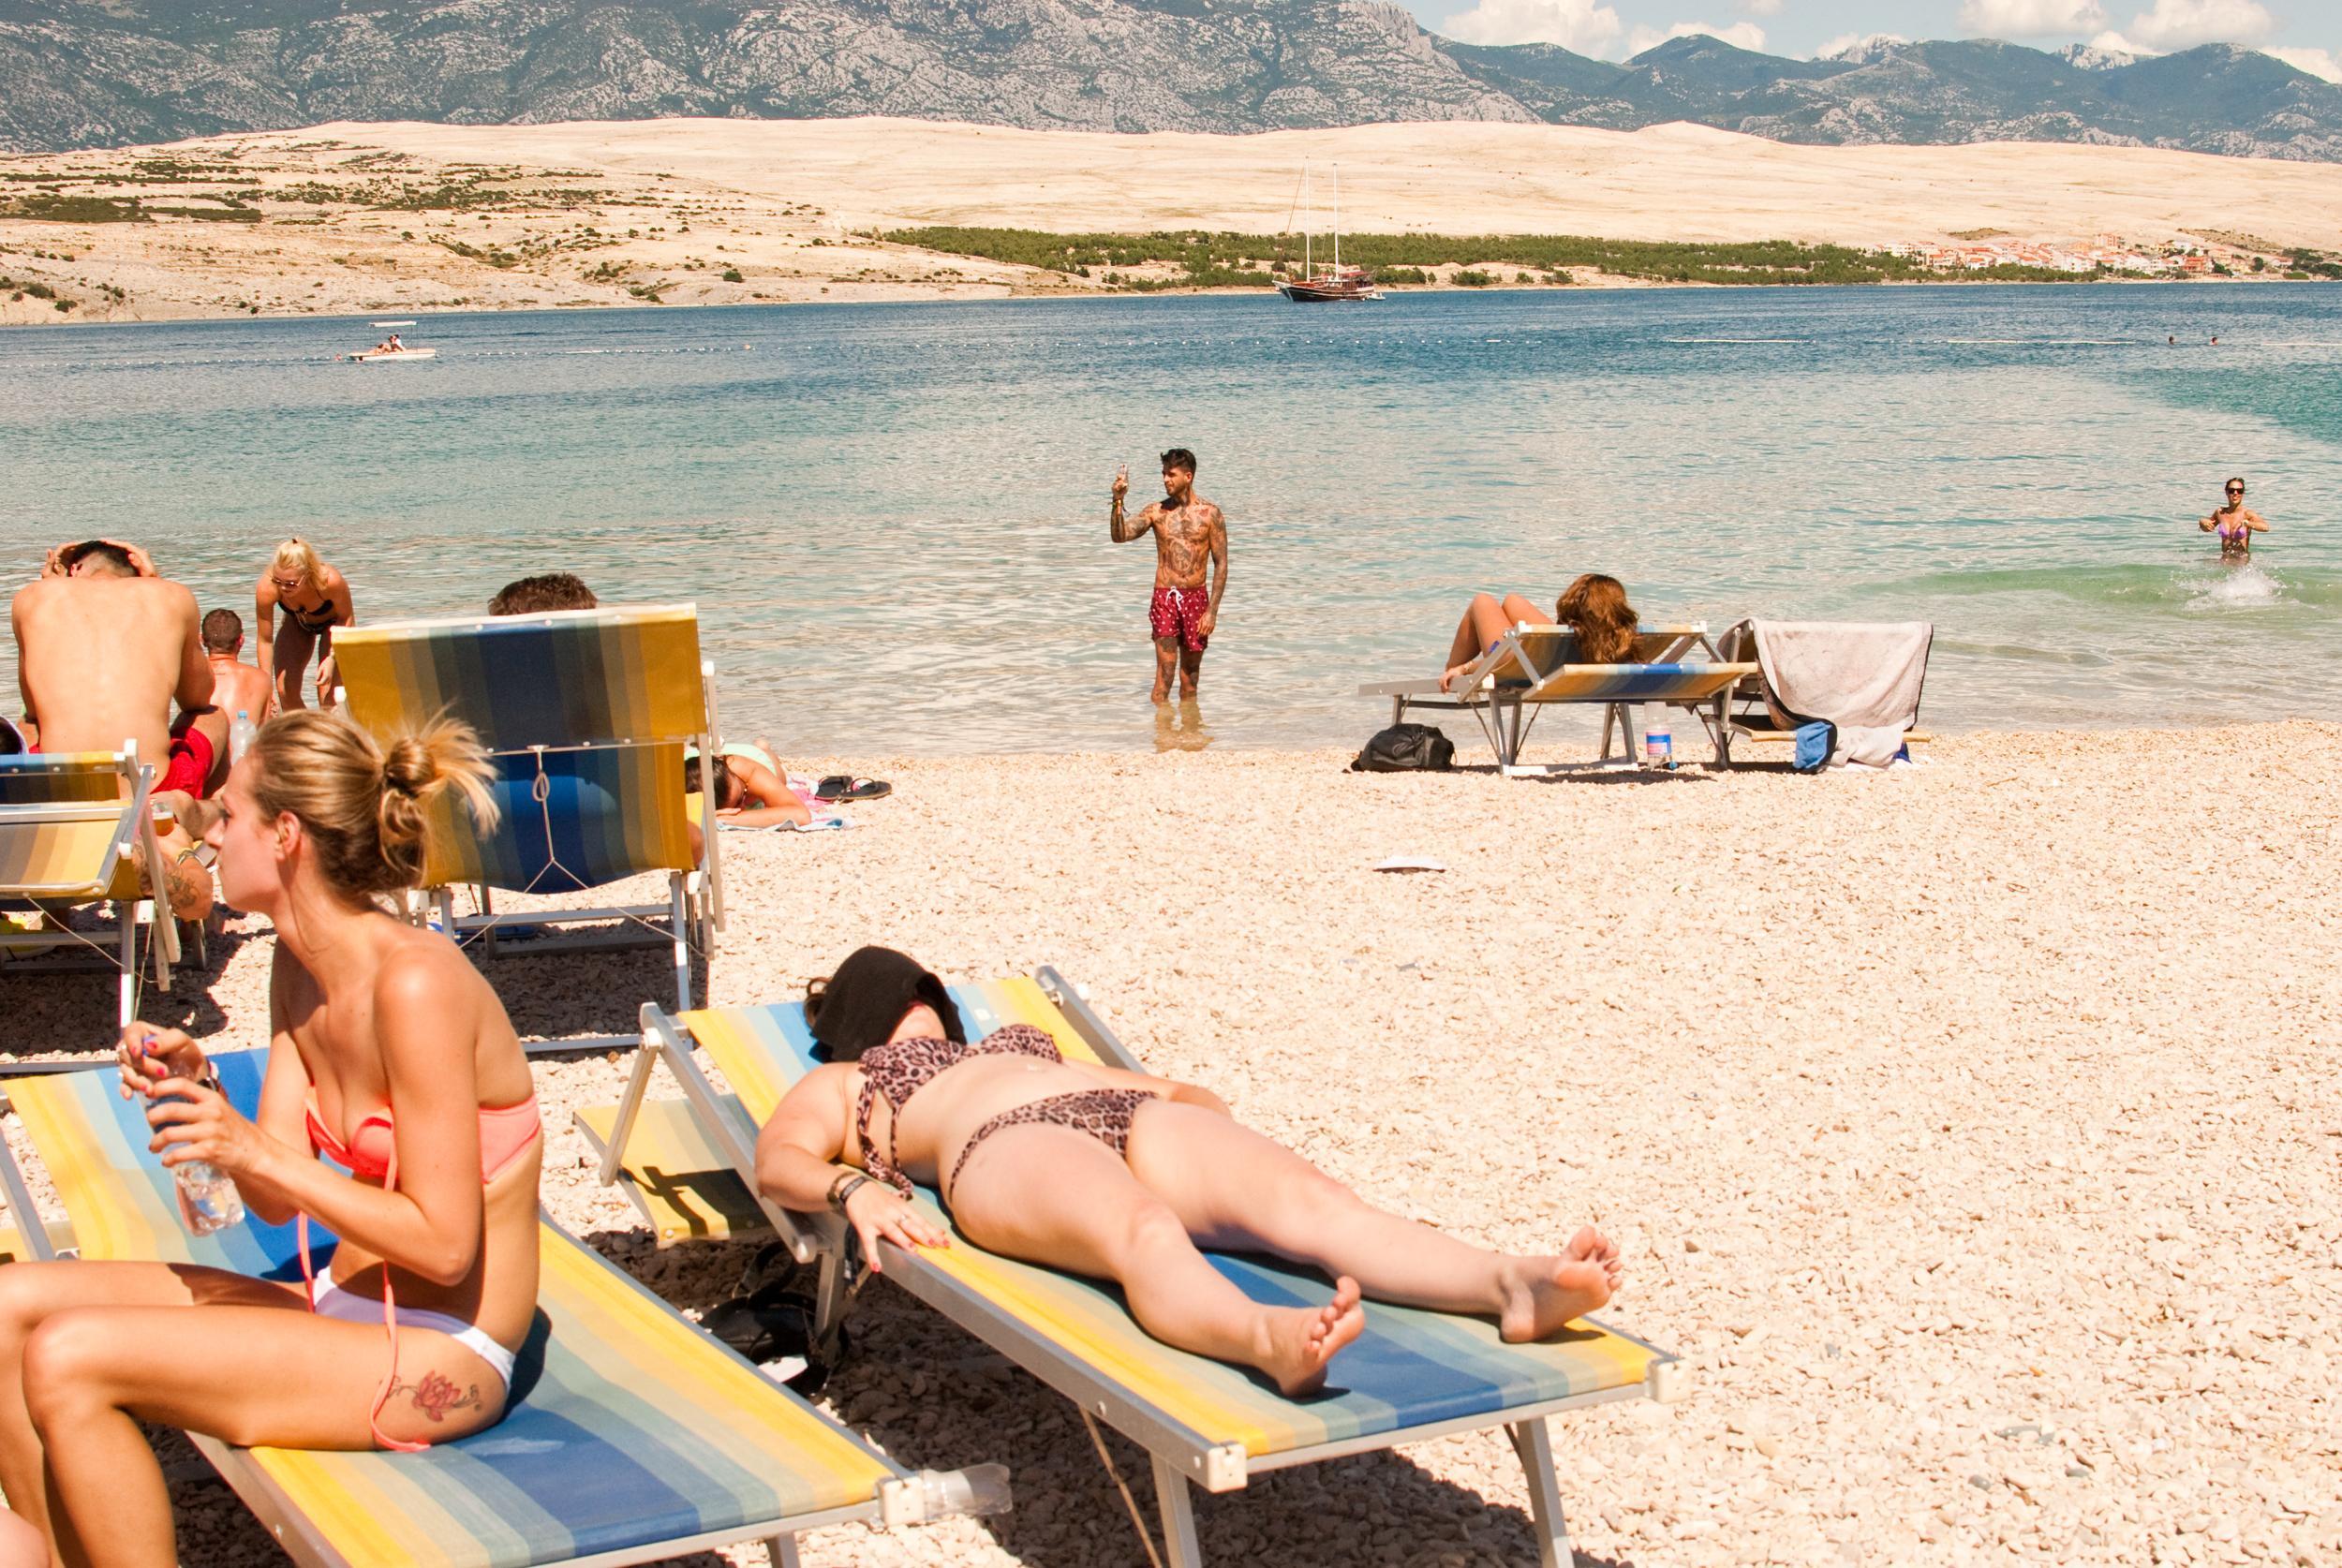 GeorginaCook_hideout_festival_croatia_sun_sea_selfie_beach.jpg